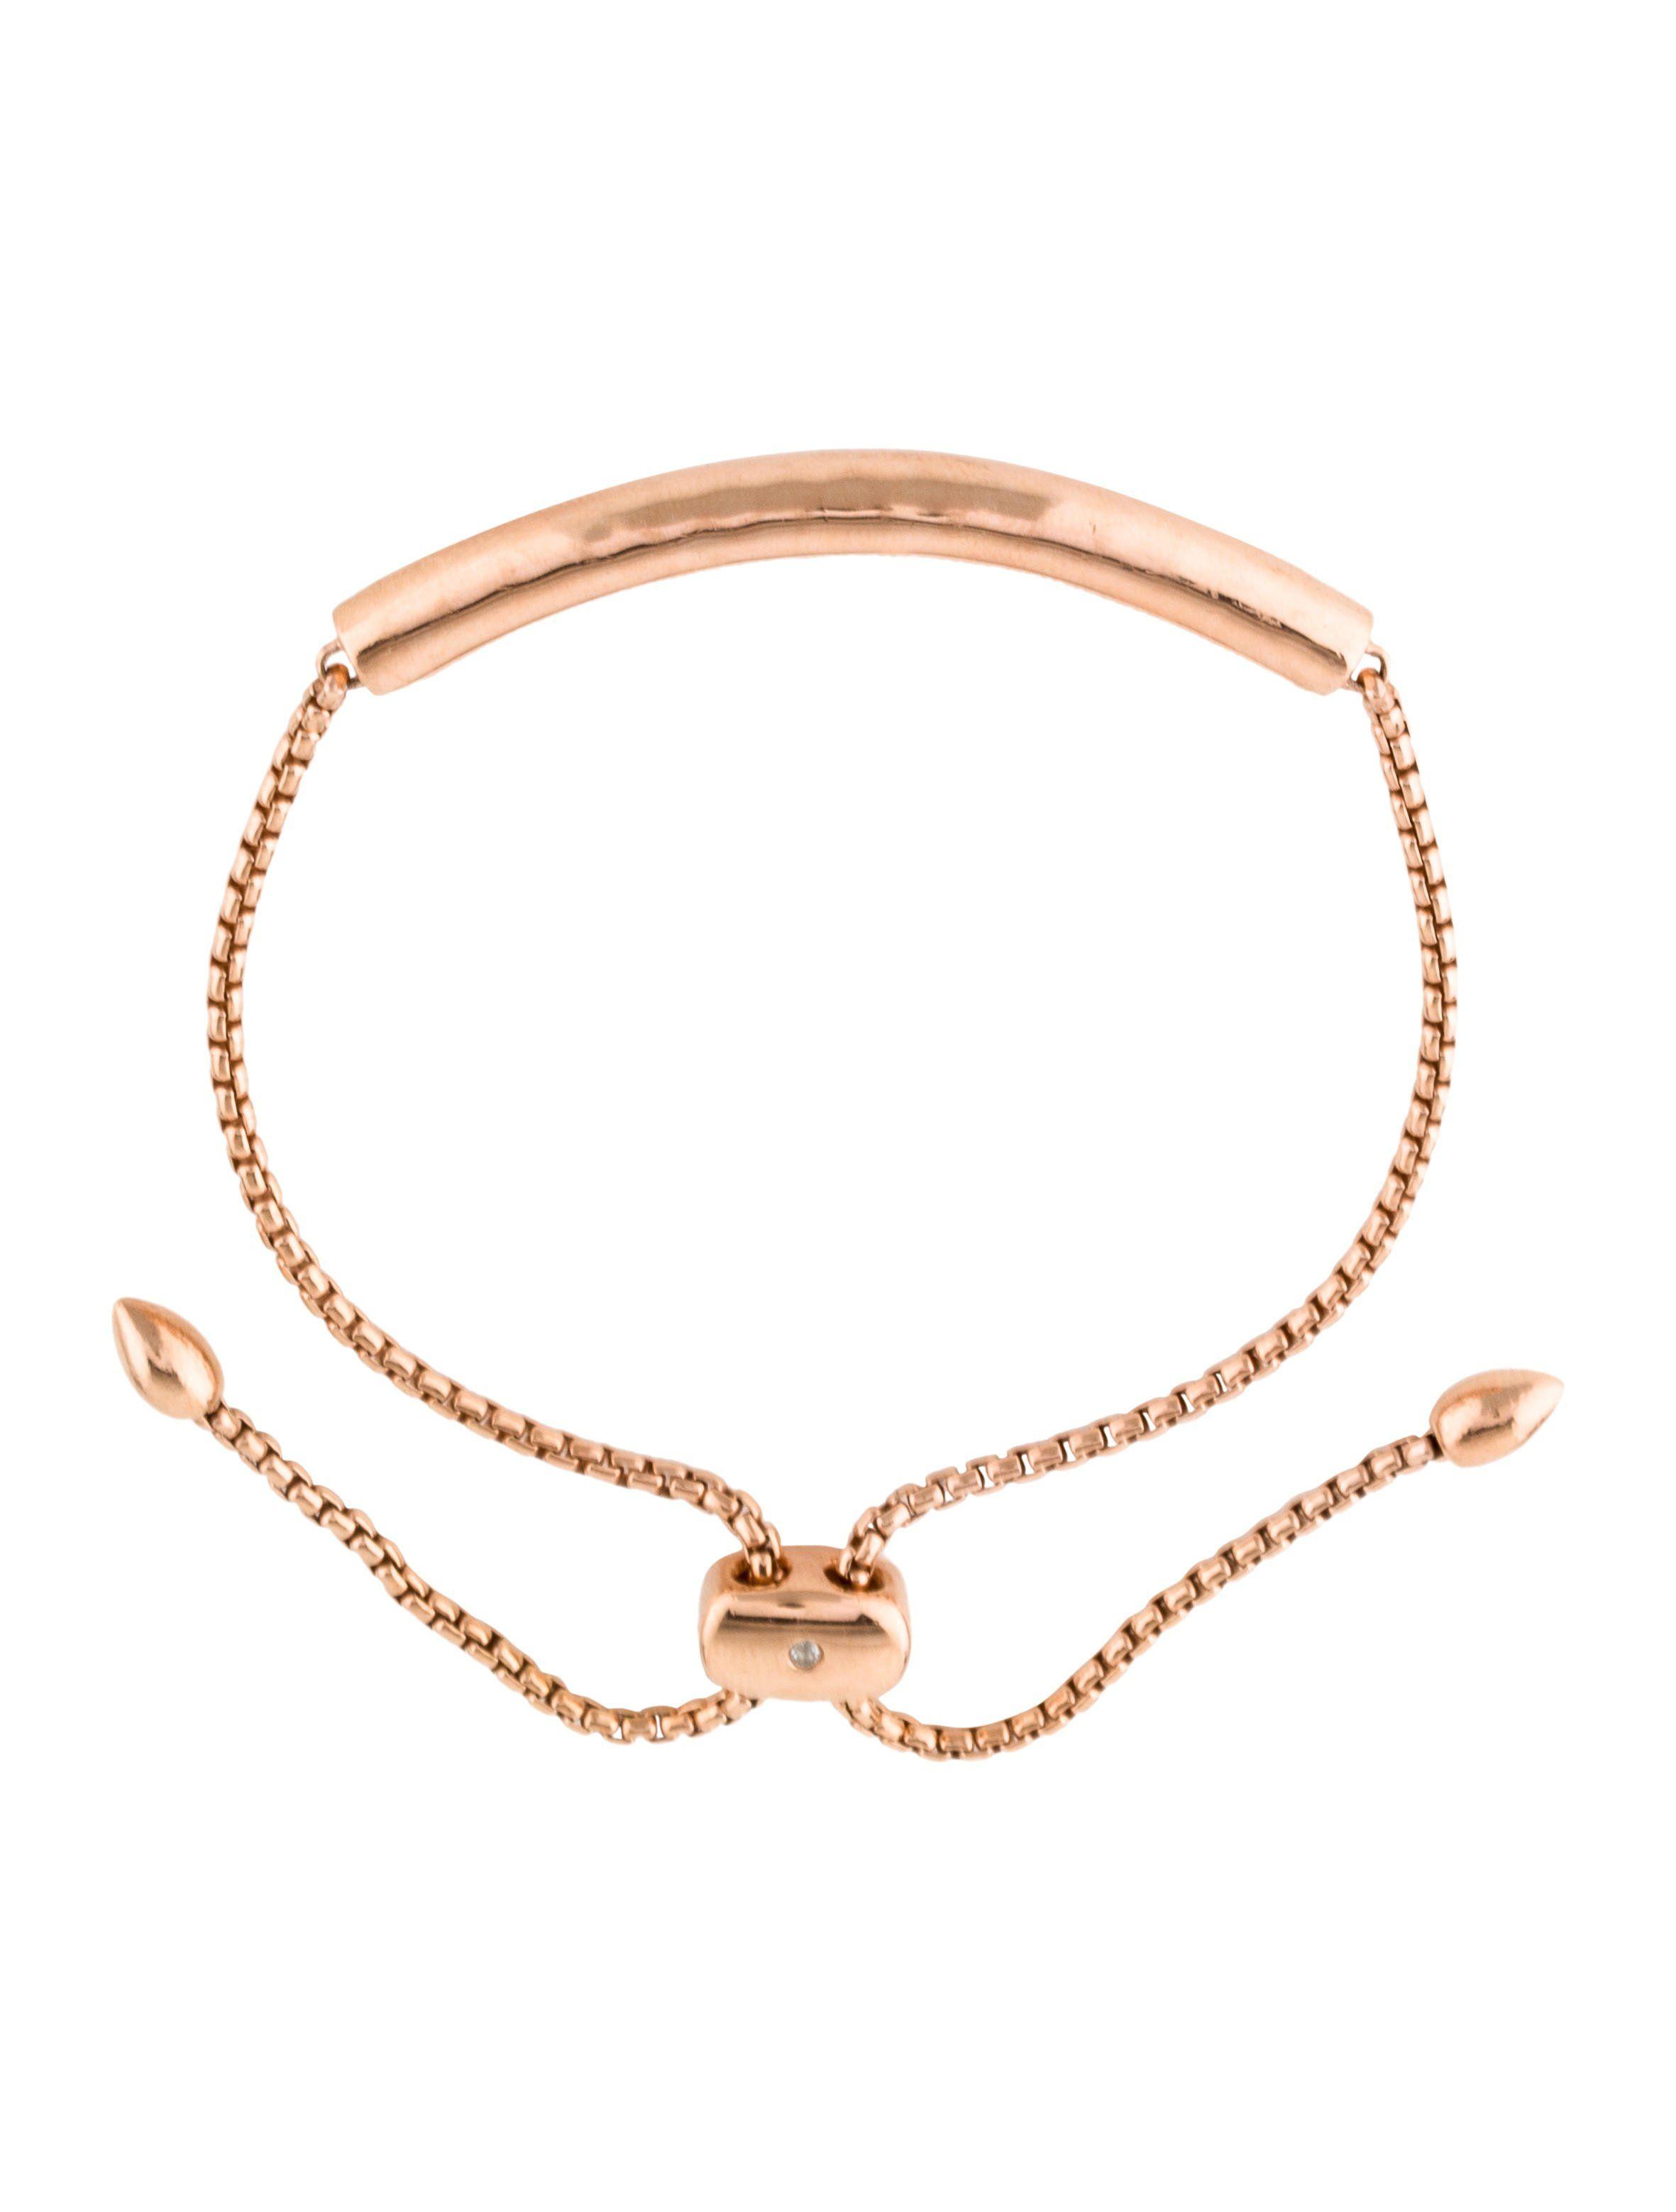 6576d52033d5a9 18K rose gold-plated and sterling silver Monica Vinader Ensencia Friendship  bracelet featuring adjustable closure.